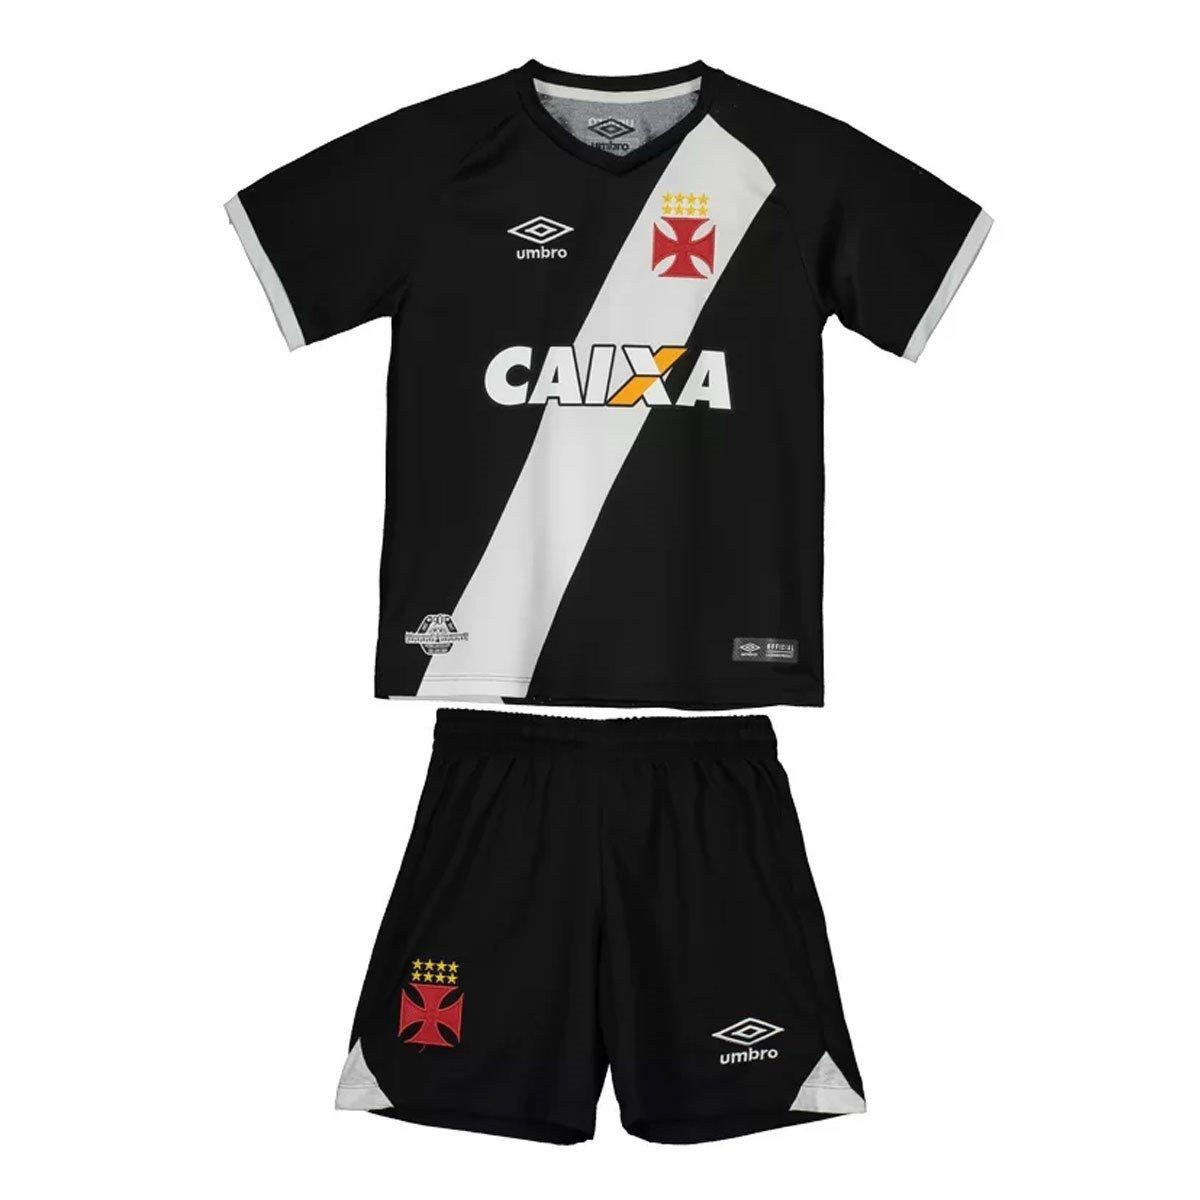 Kit Infantil Umbro Vasco I 2017 - Compre Agora  cb7f573b2701e